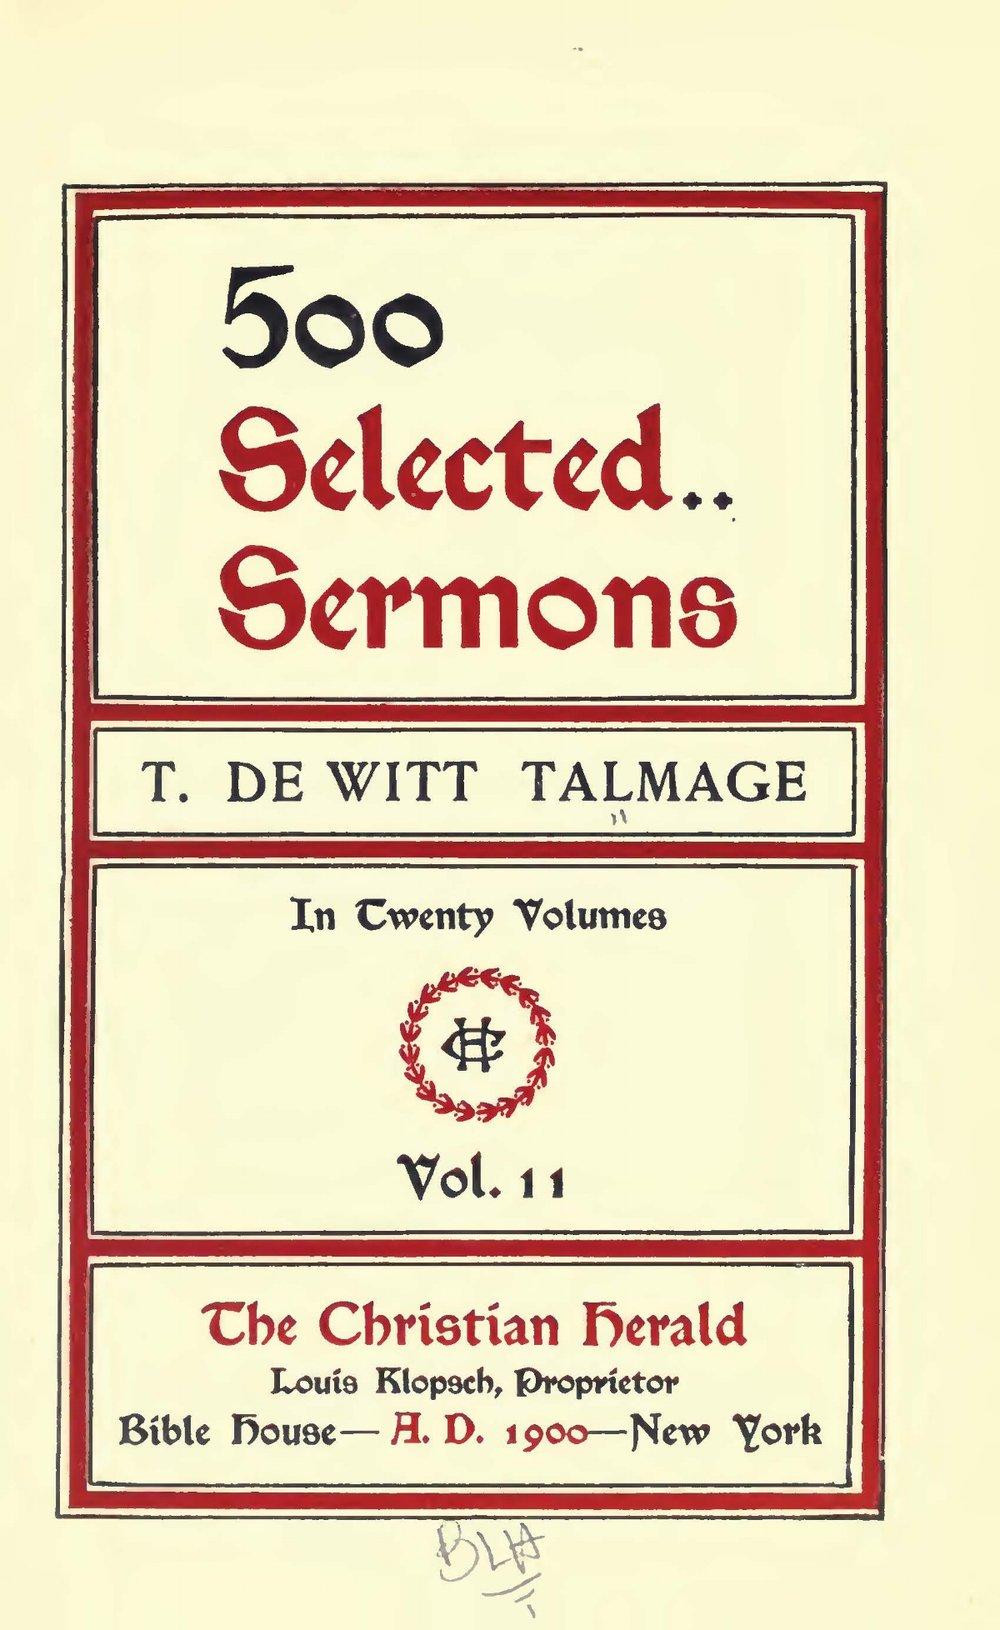 Talmage, Thomas De Witt, 500 Selected Sermons, Vol. 11 Title Page.jpg